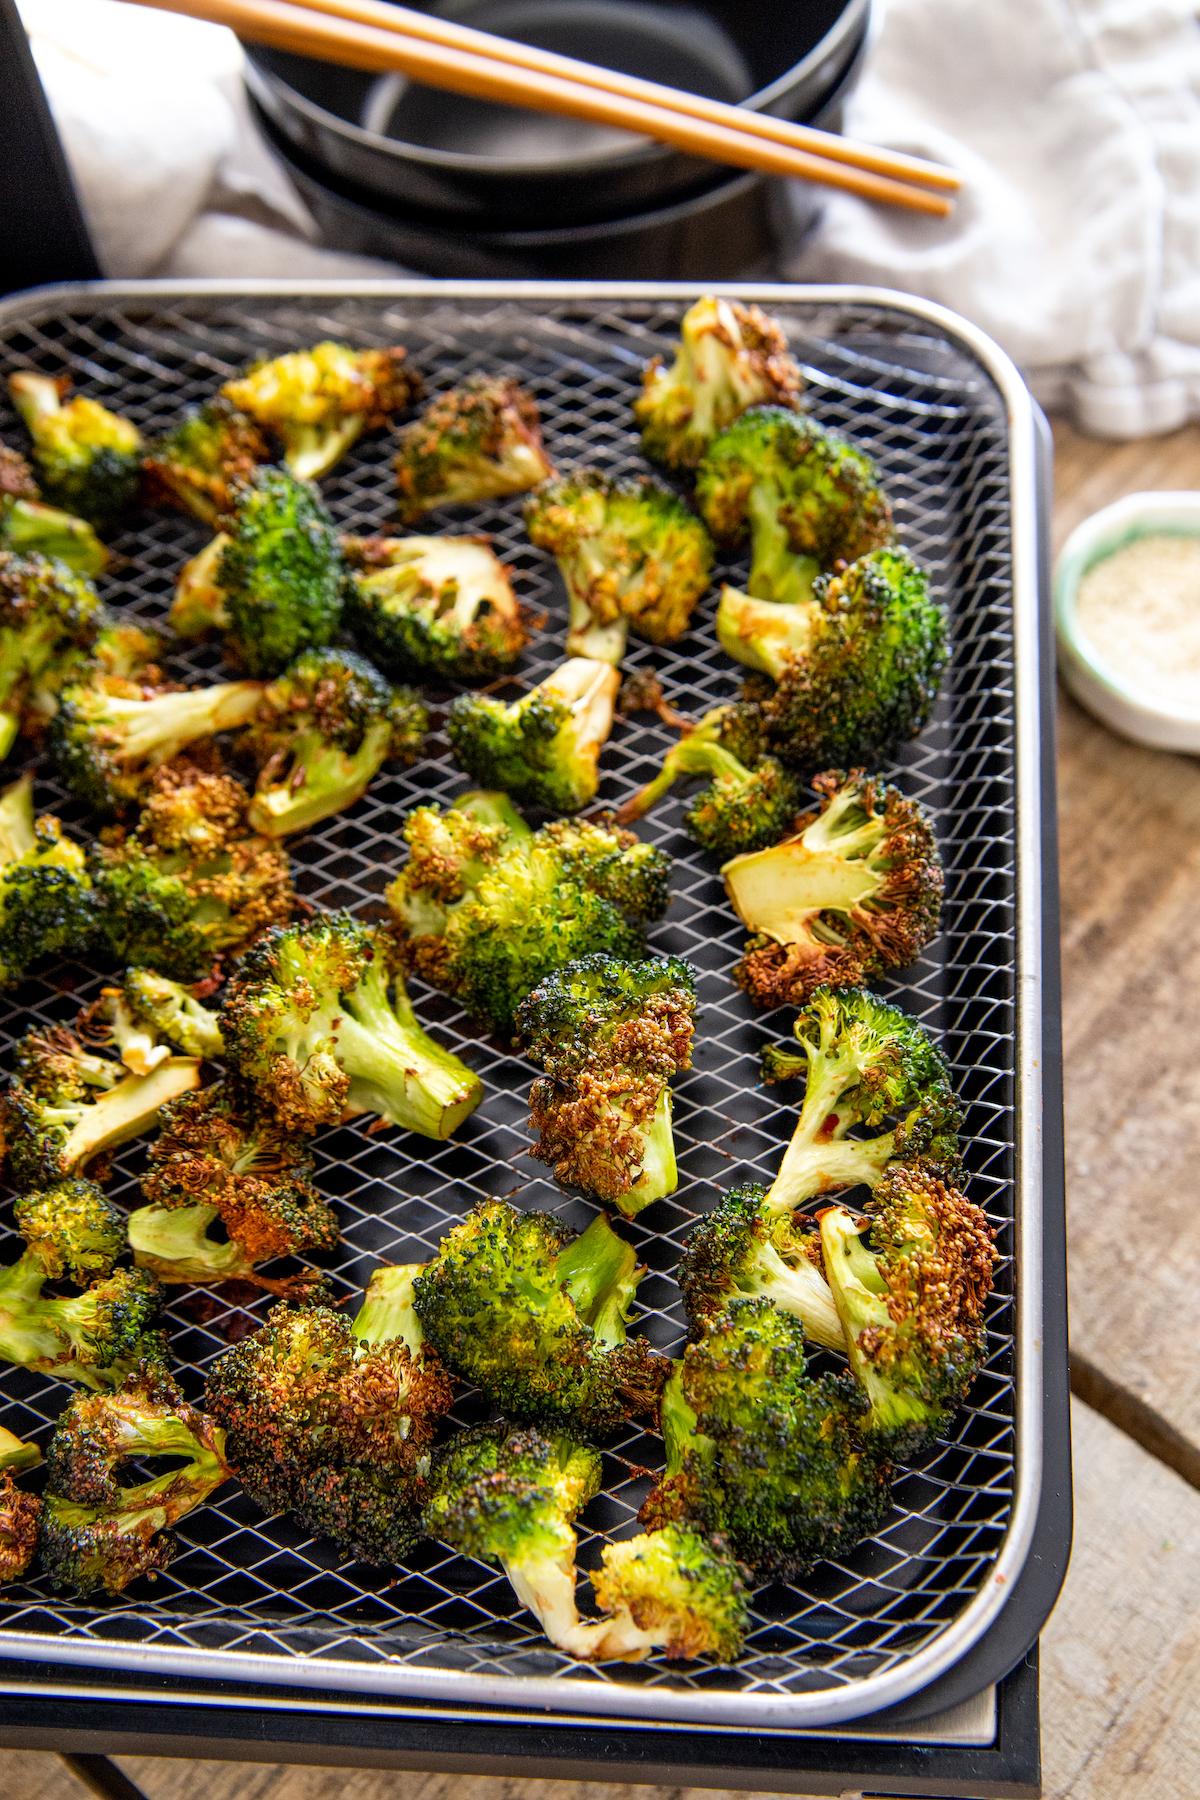 Broccoli florets on an air fryer tray.